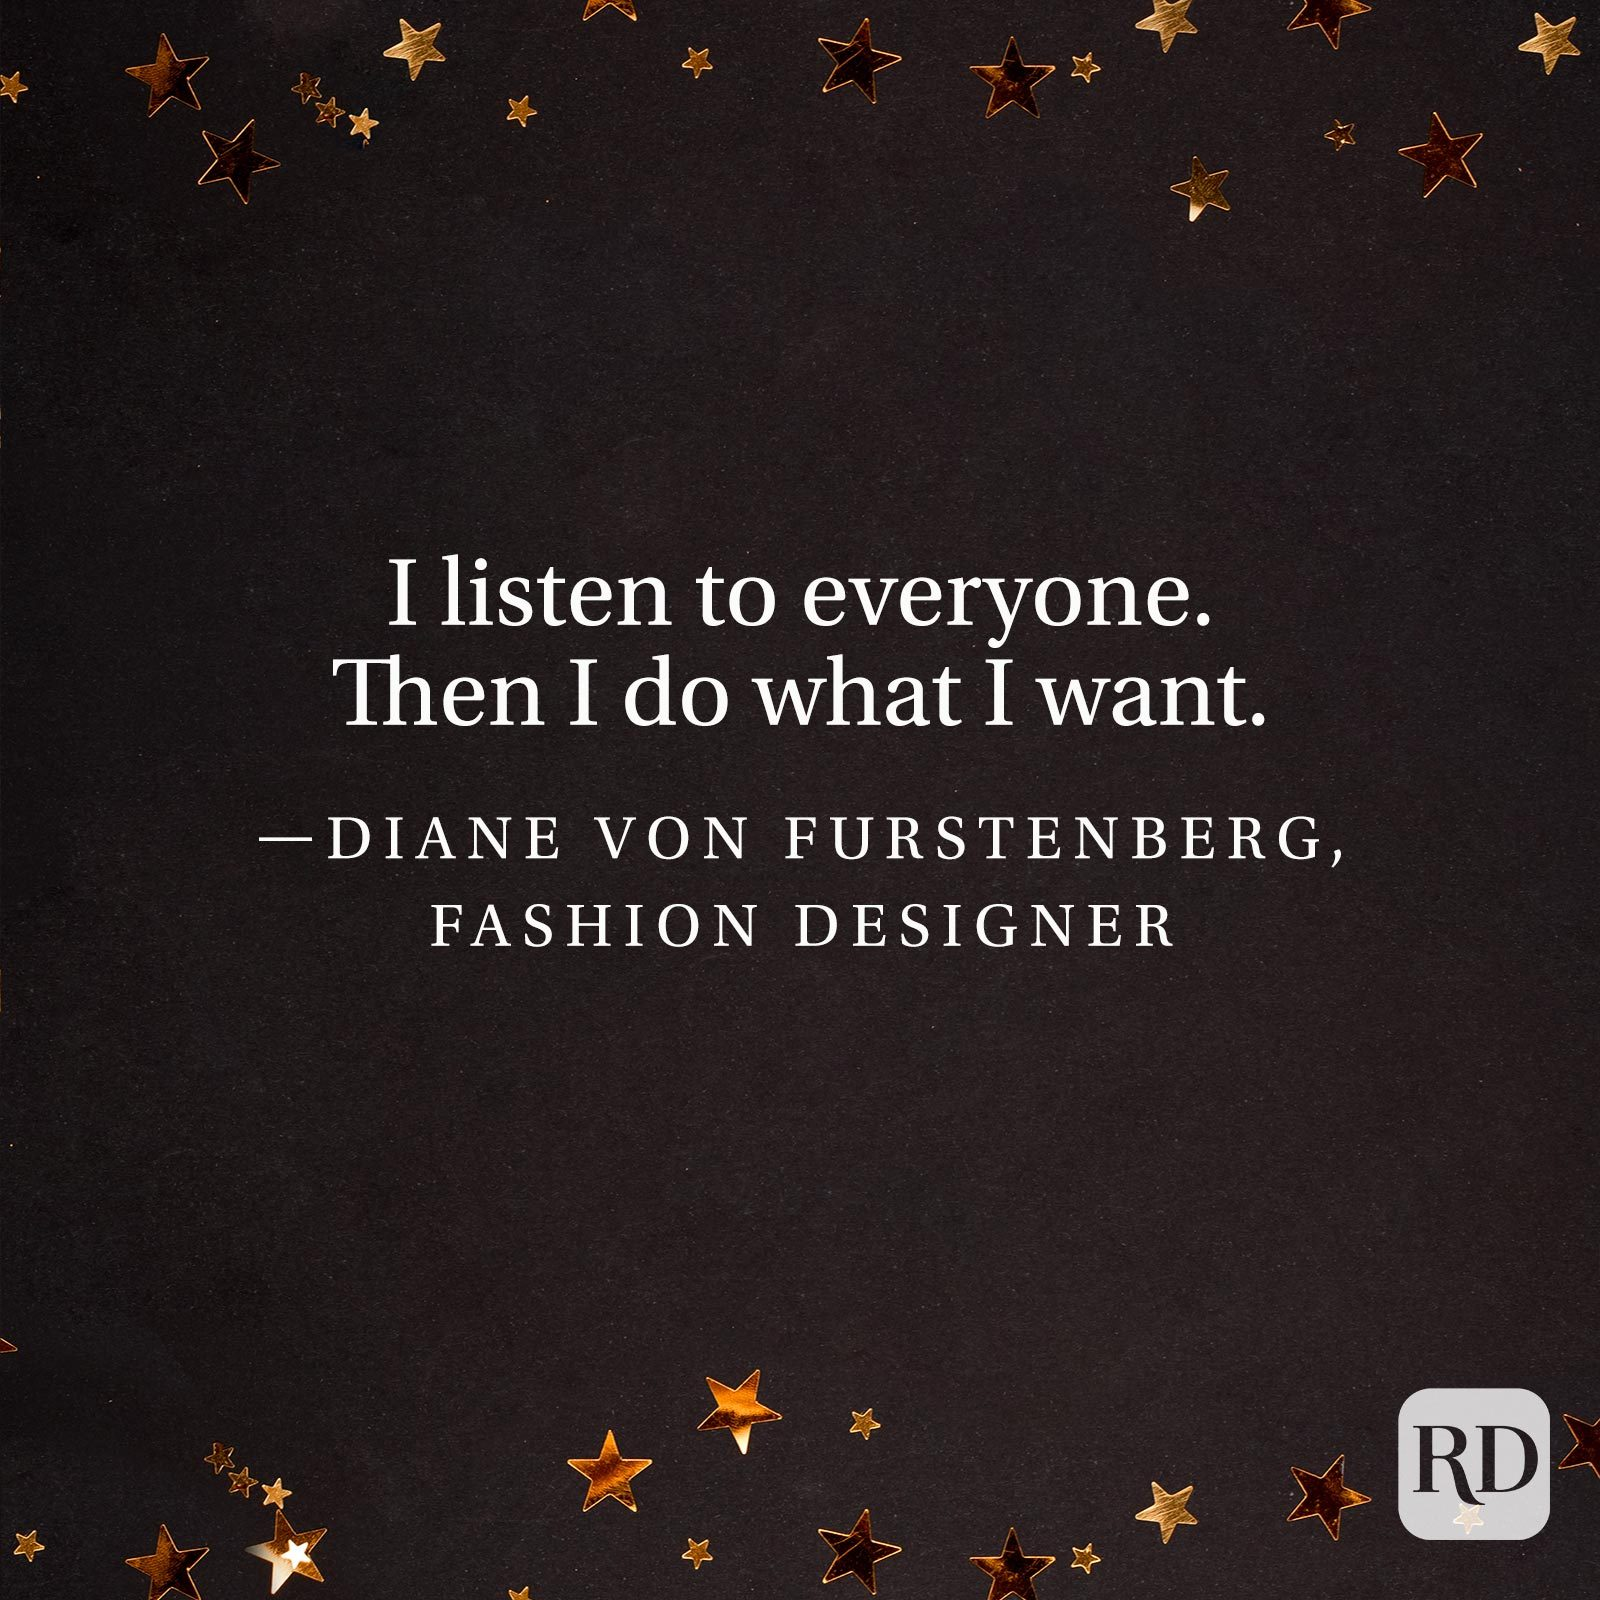 """I listen to everyone. Then I do what I want."" —Diane Von Furstenberg, fashion designer"